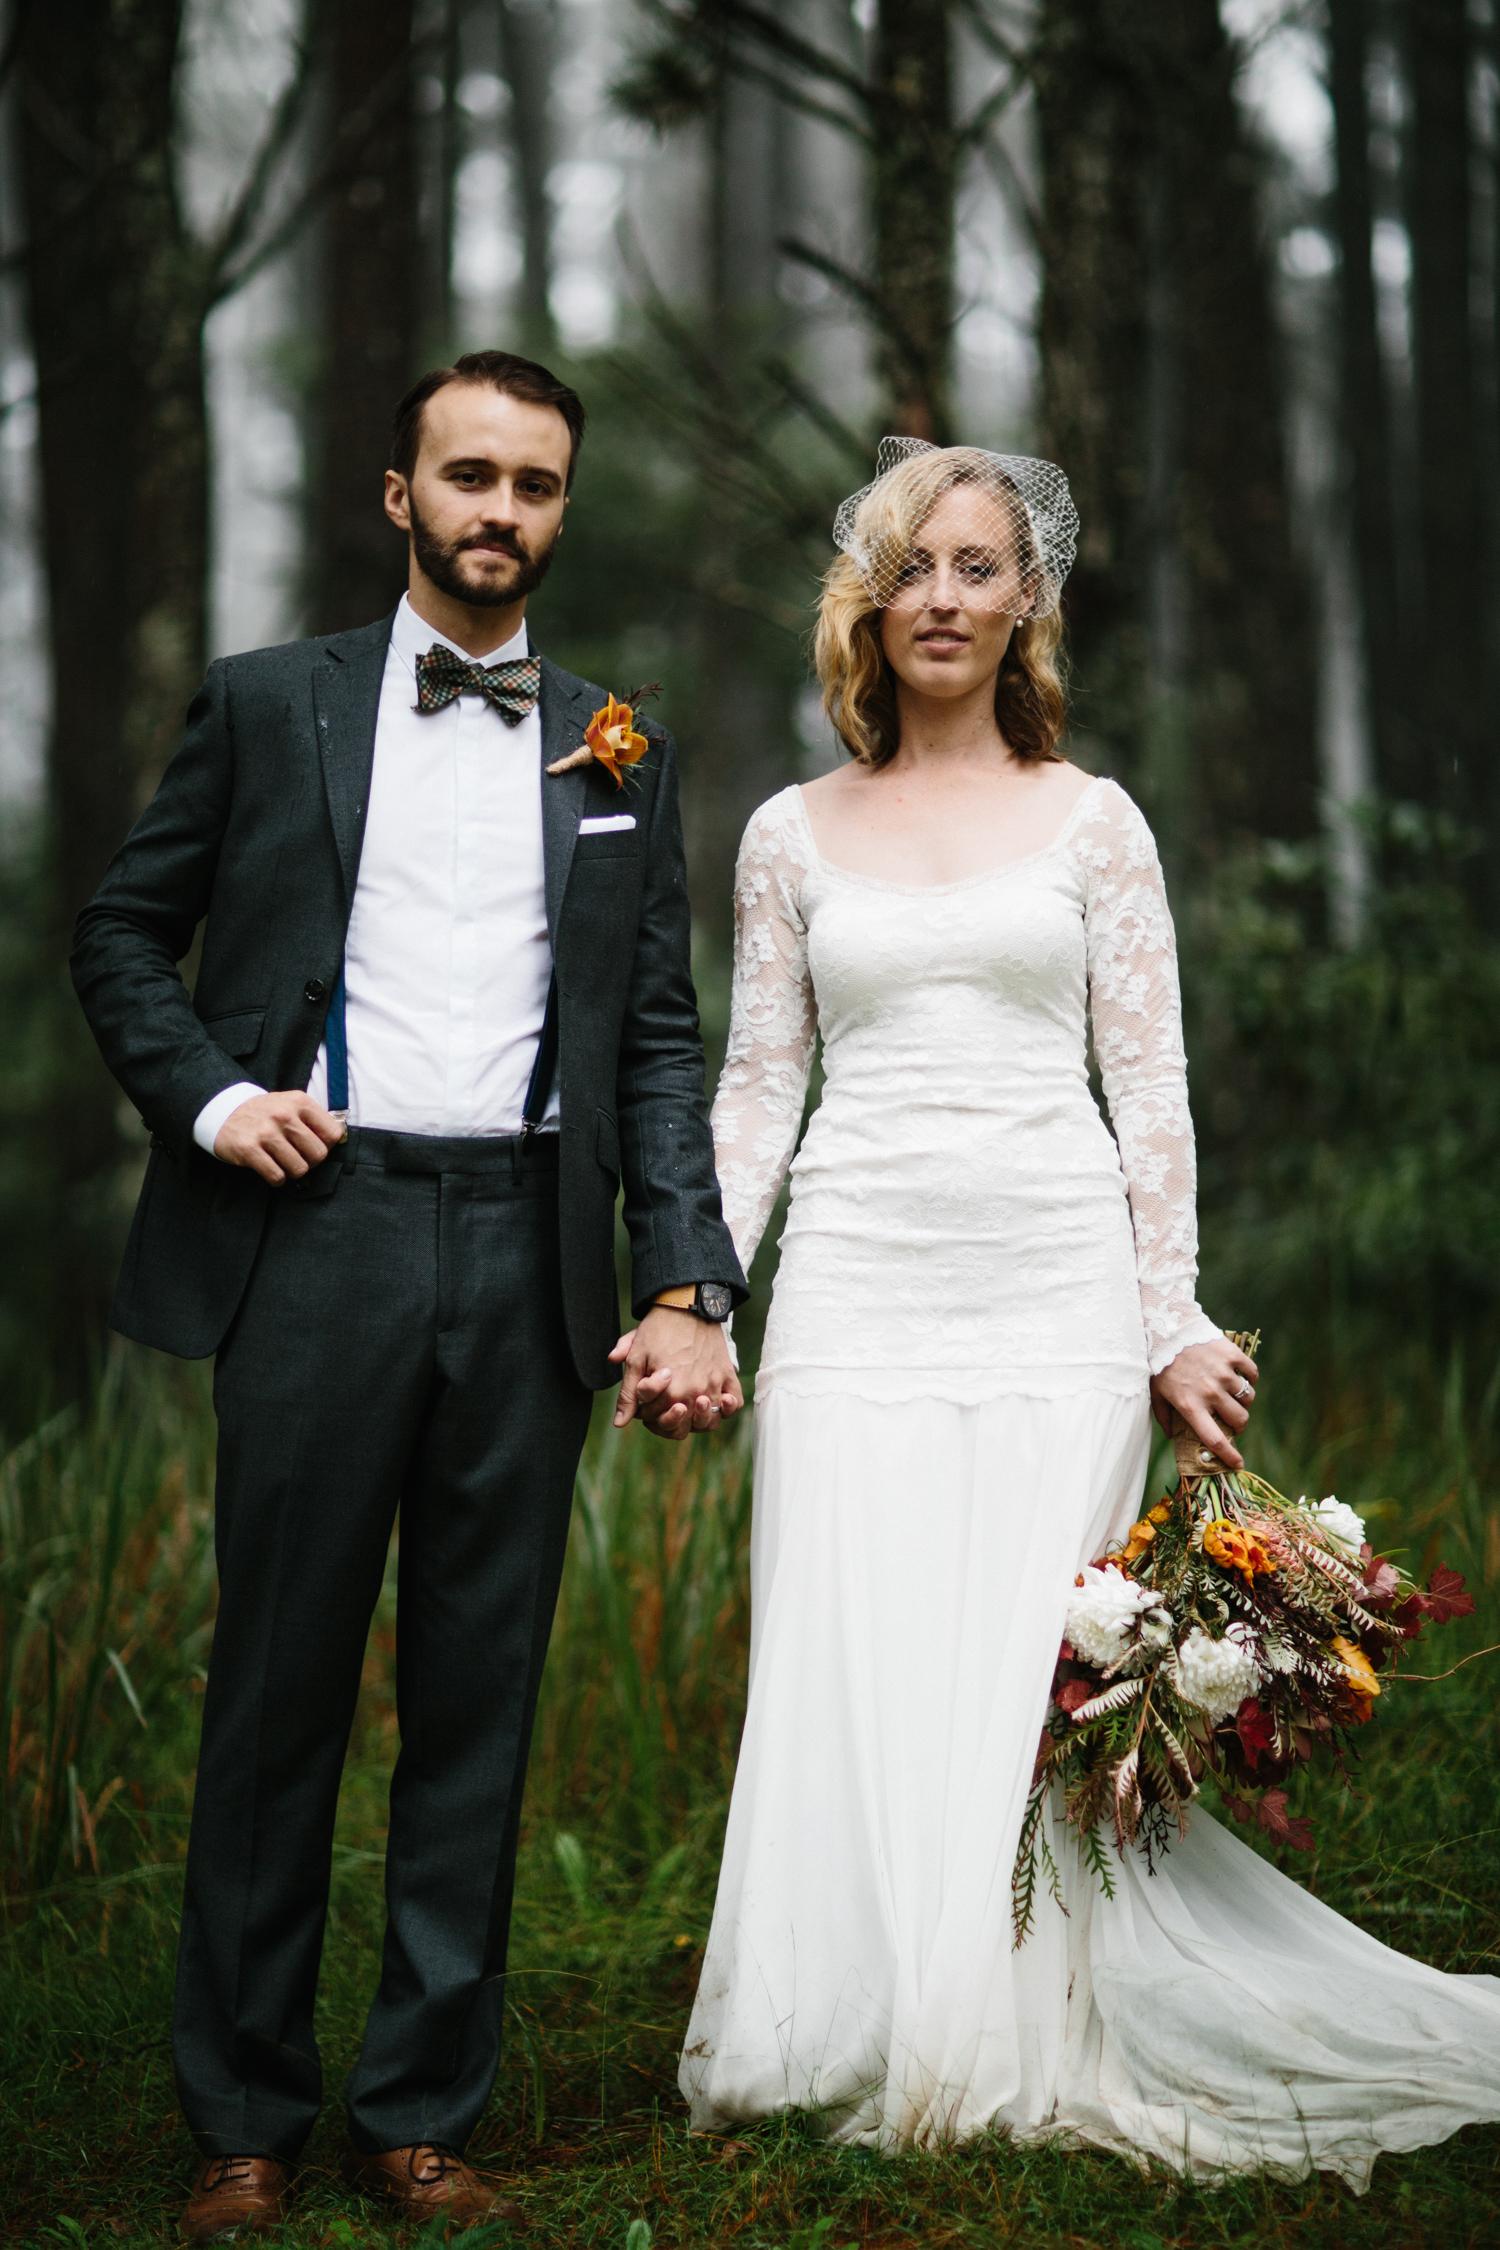 Lindsay-Nick-bilpin-pine-forrest-nsw-wedding-137